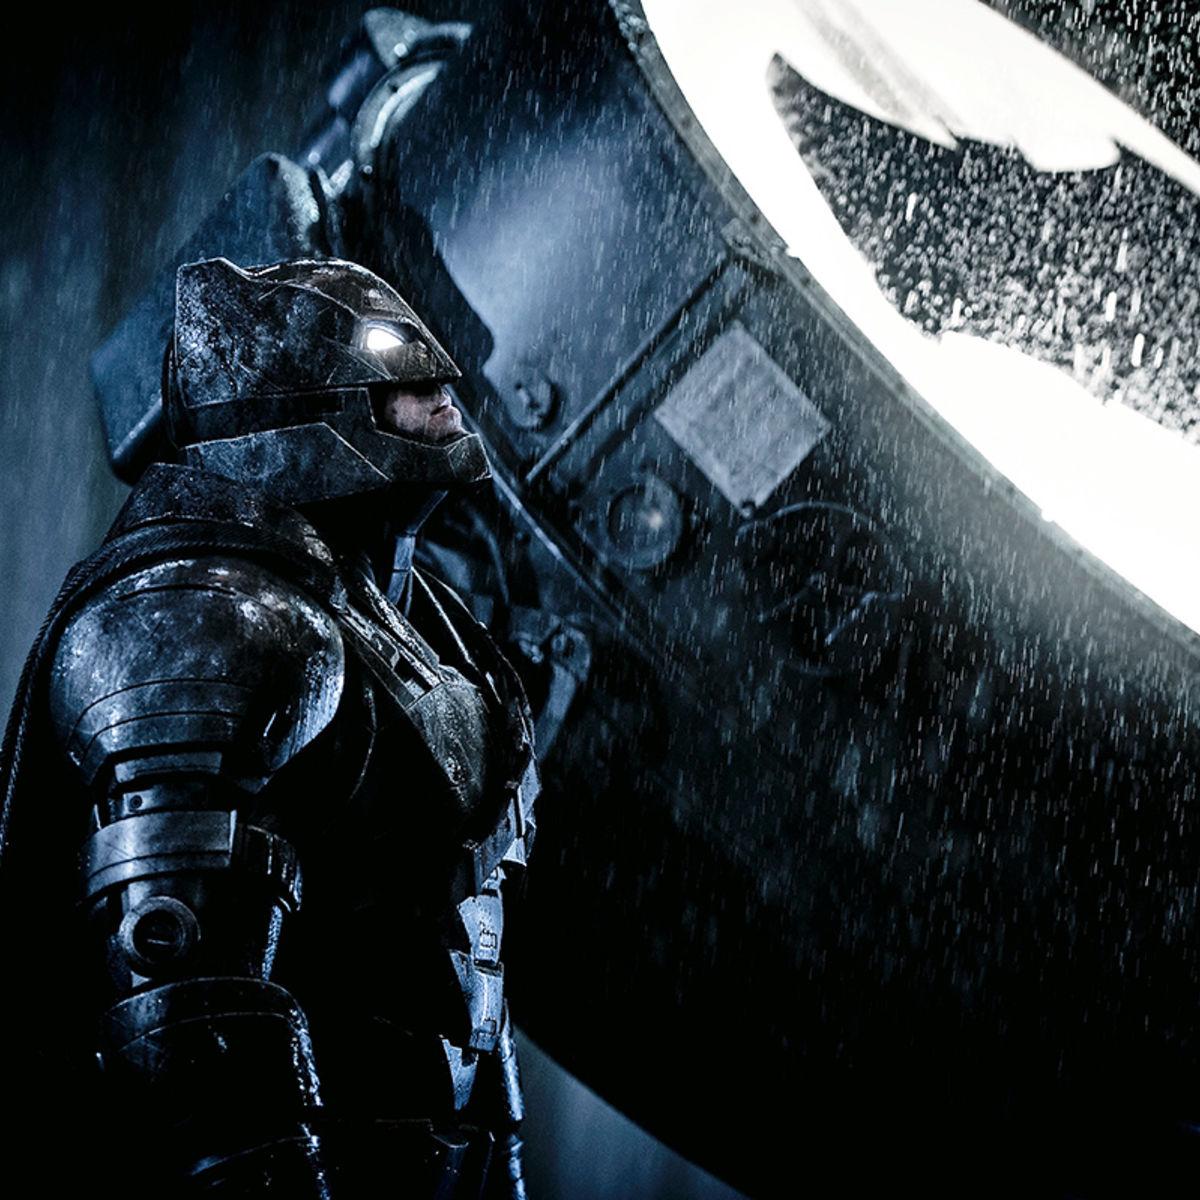 BatmanvSupermanSignal.jpg